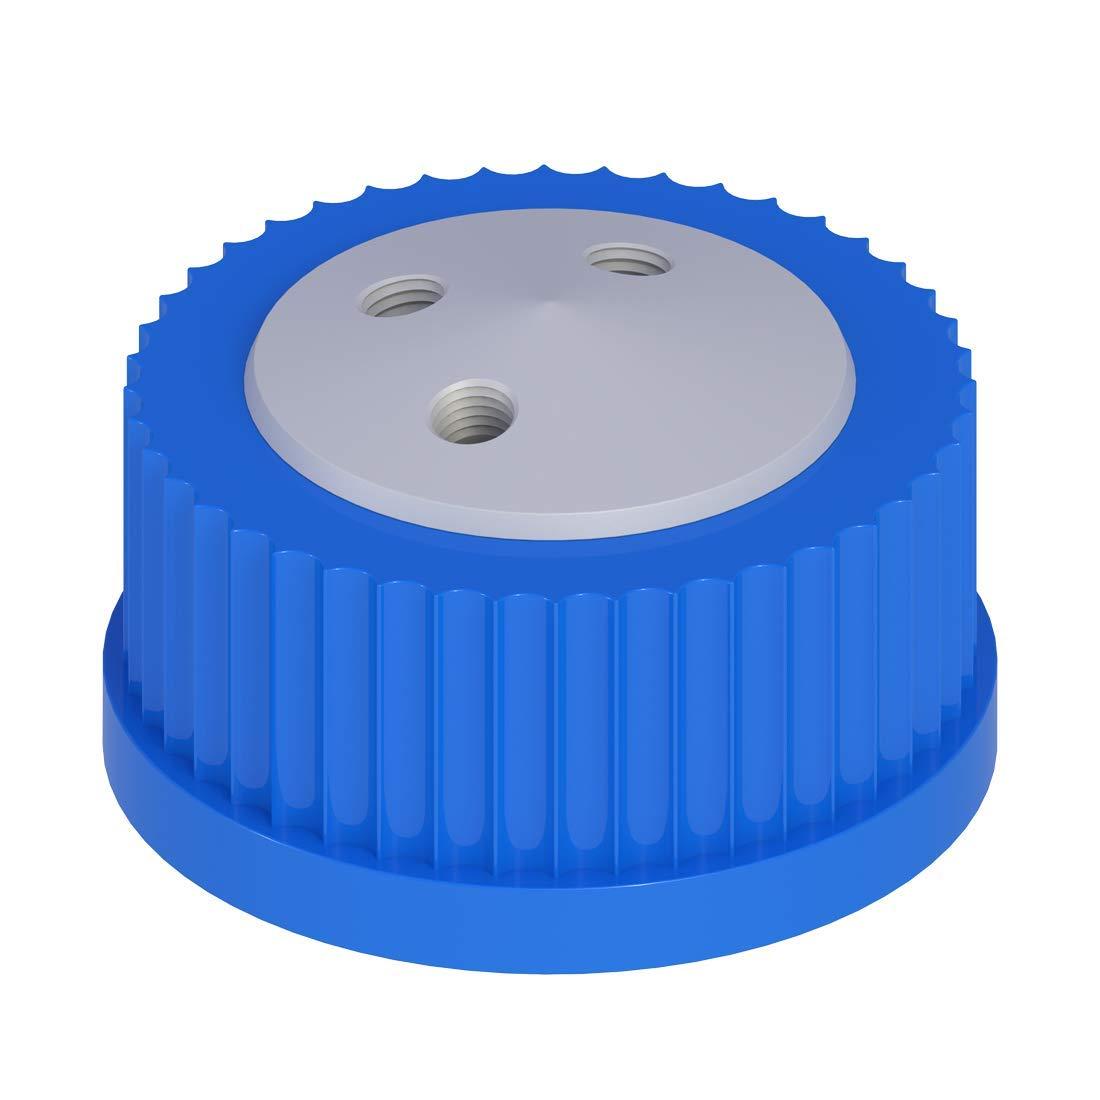 Vaplock S45X-3D Safety Cap, GL45, (3) 1/4-28 Ports, PTFE with PP Spin Collar